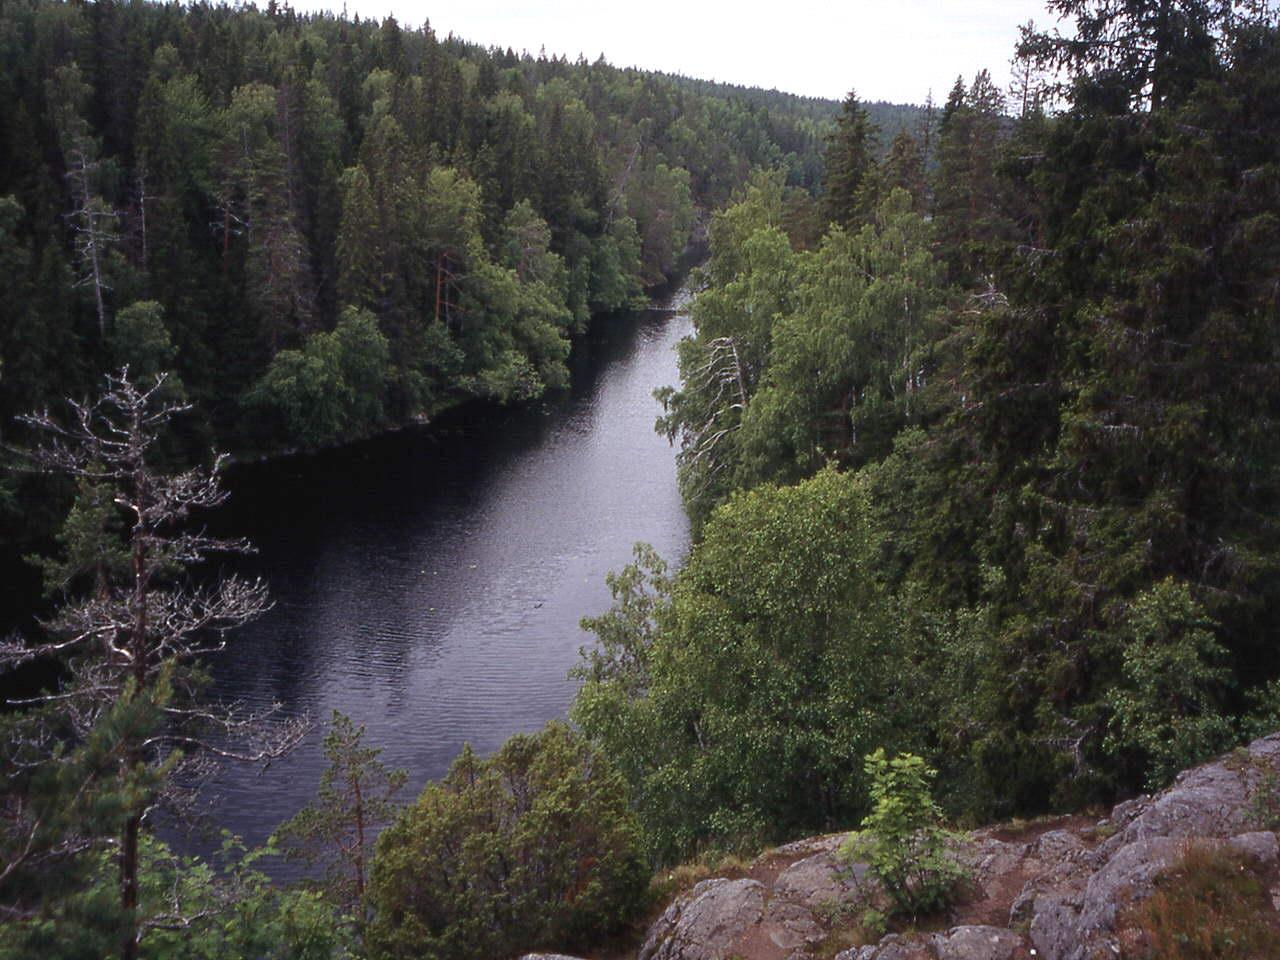 Parco nazionale di Helvetinjärvi